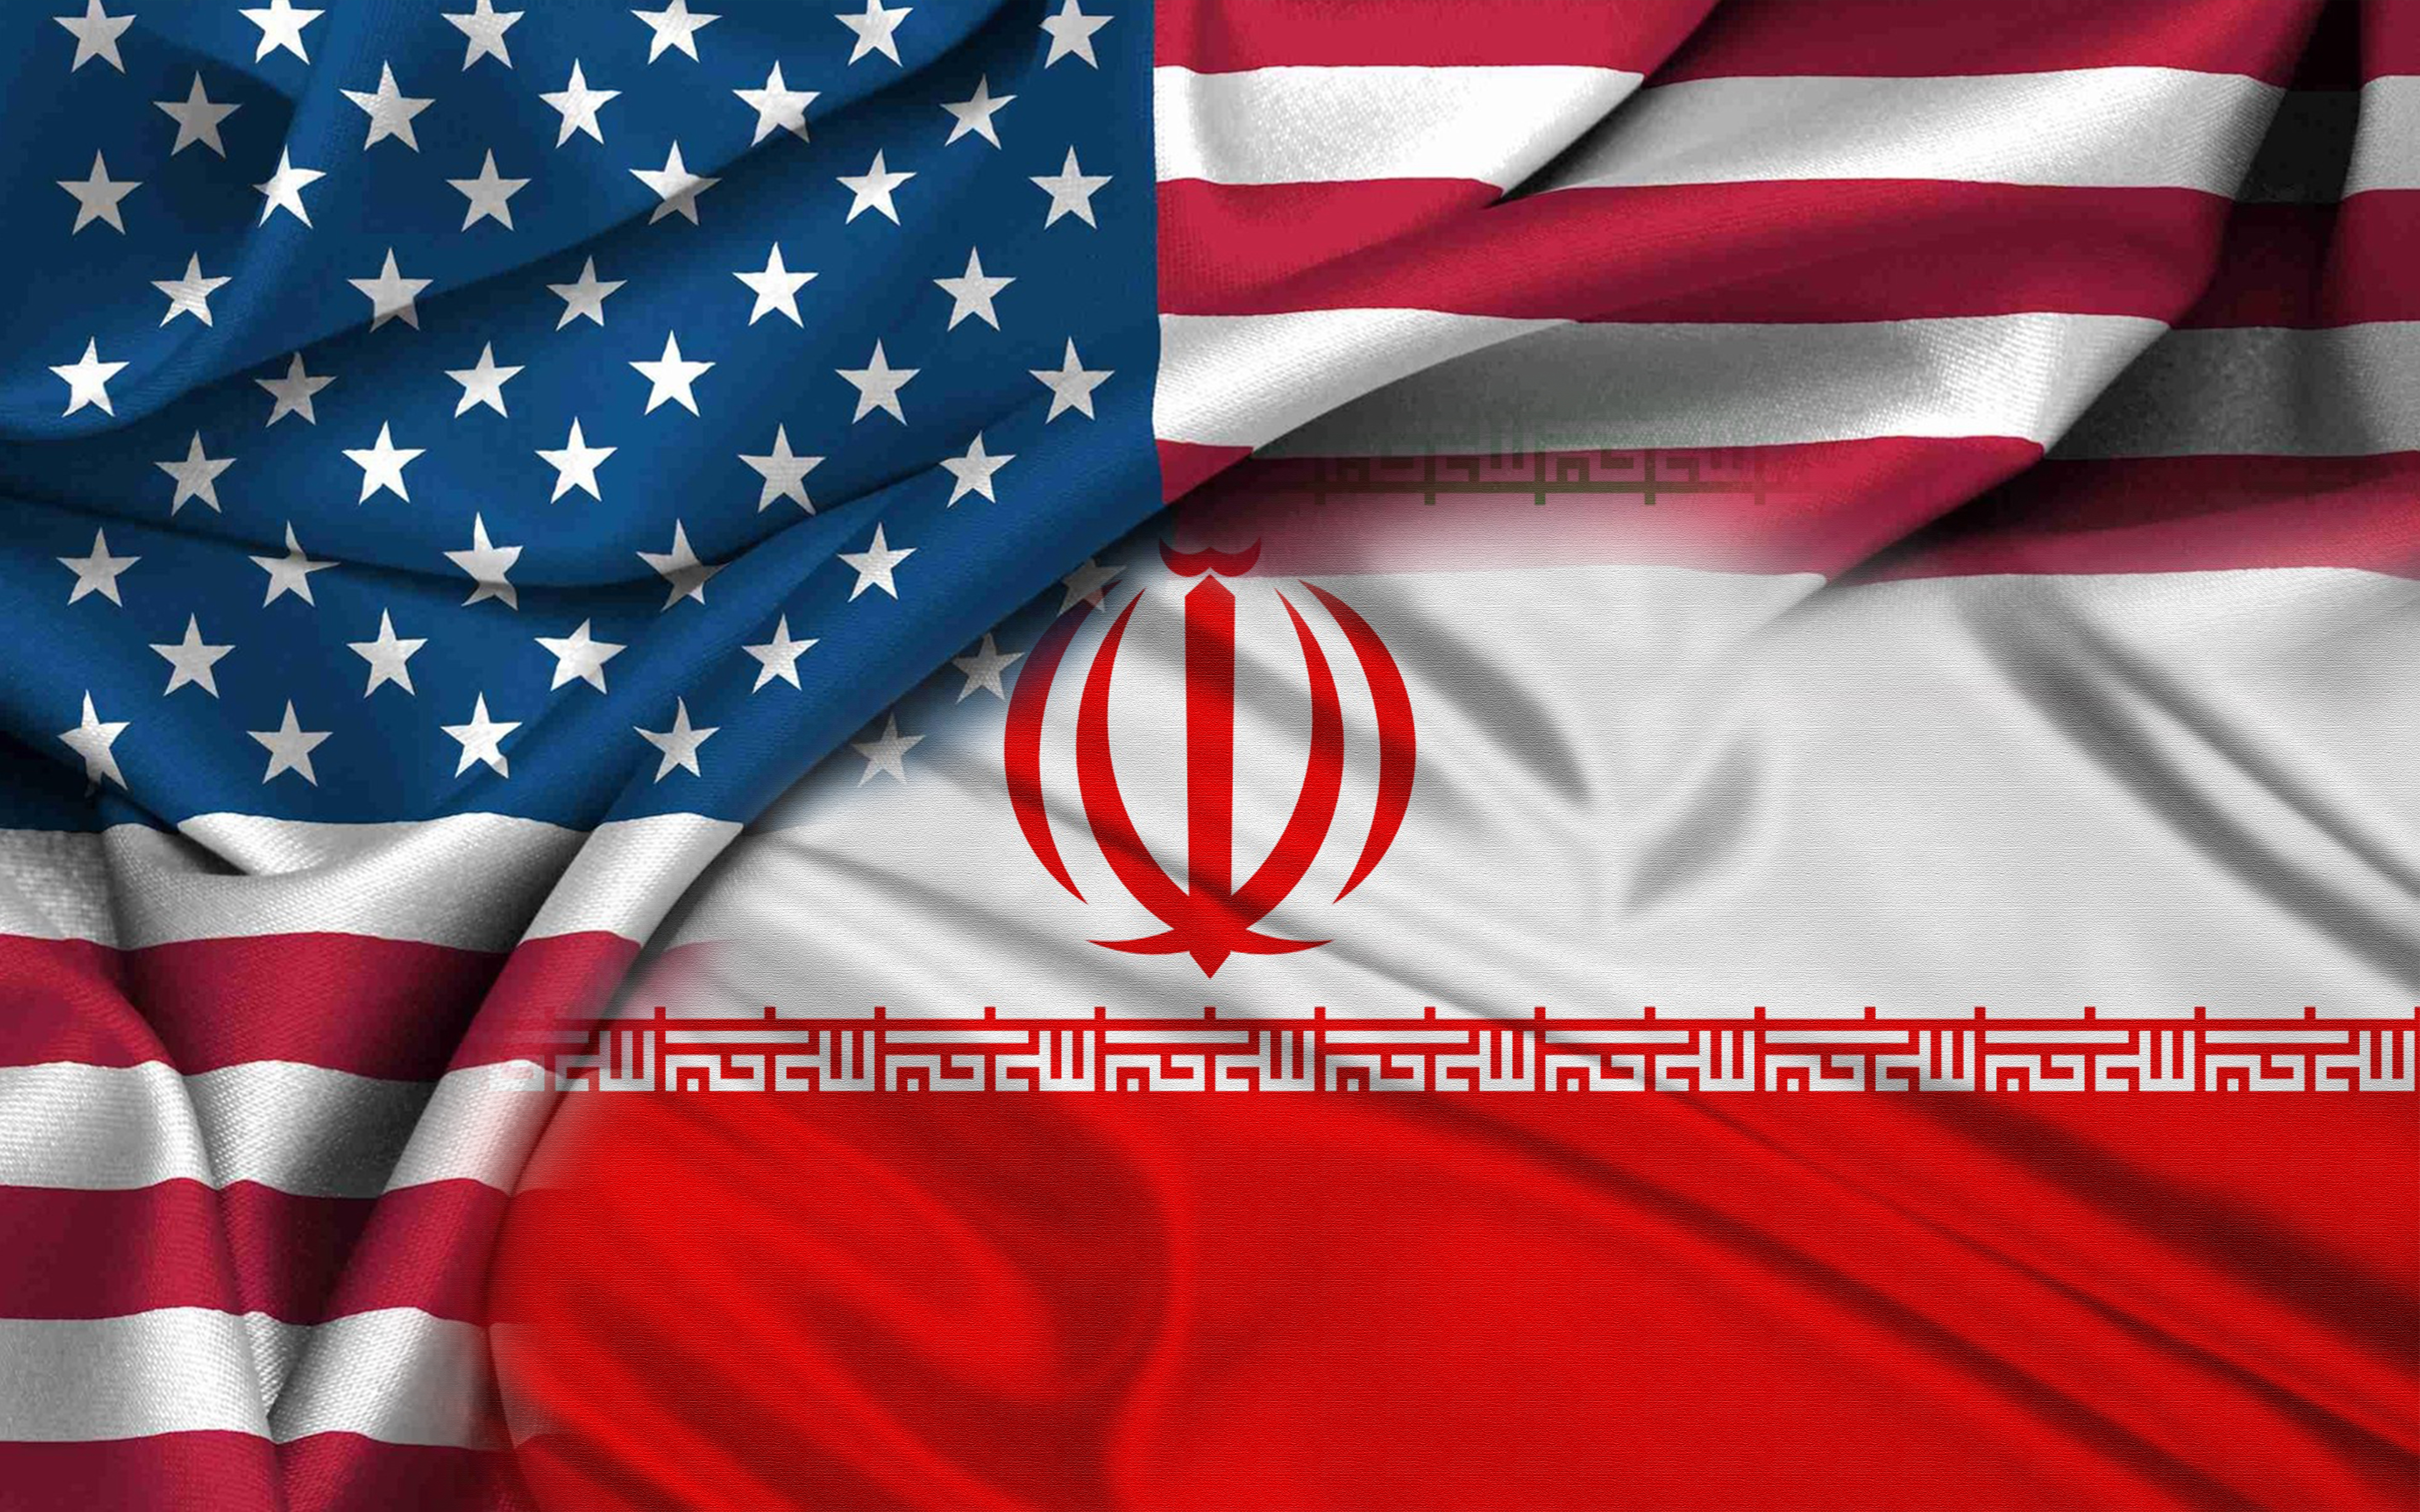 Минфин США расширил санкции в отношении Ирана